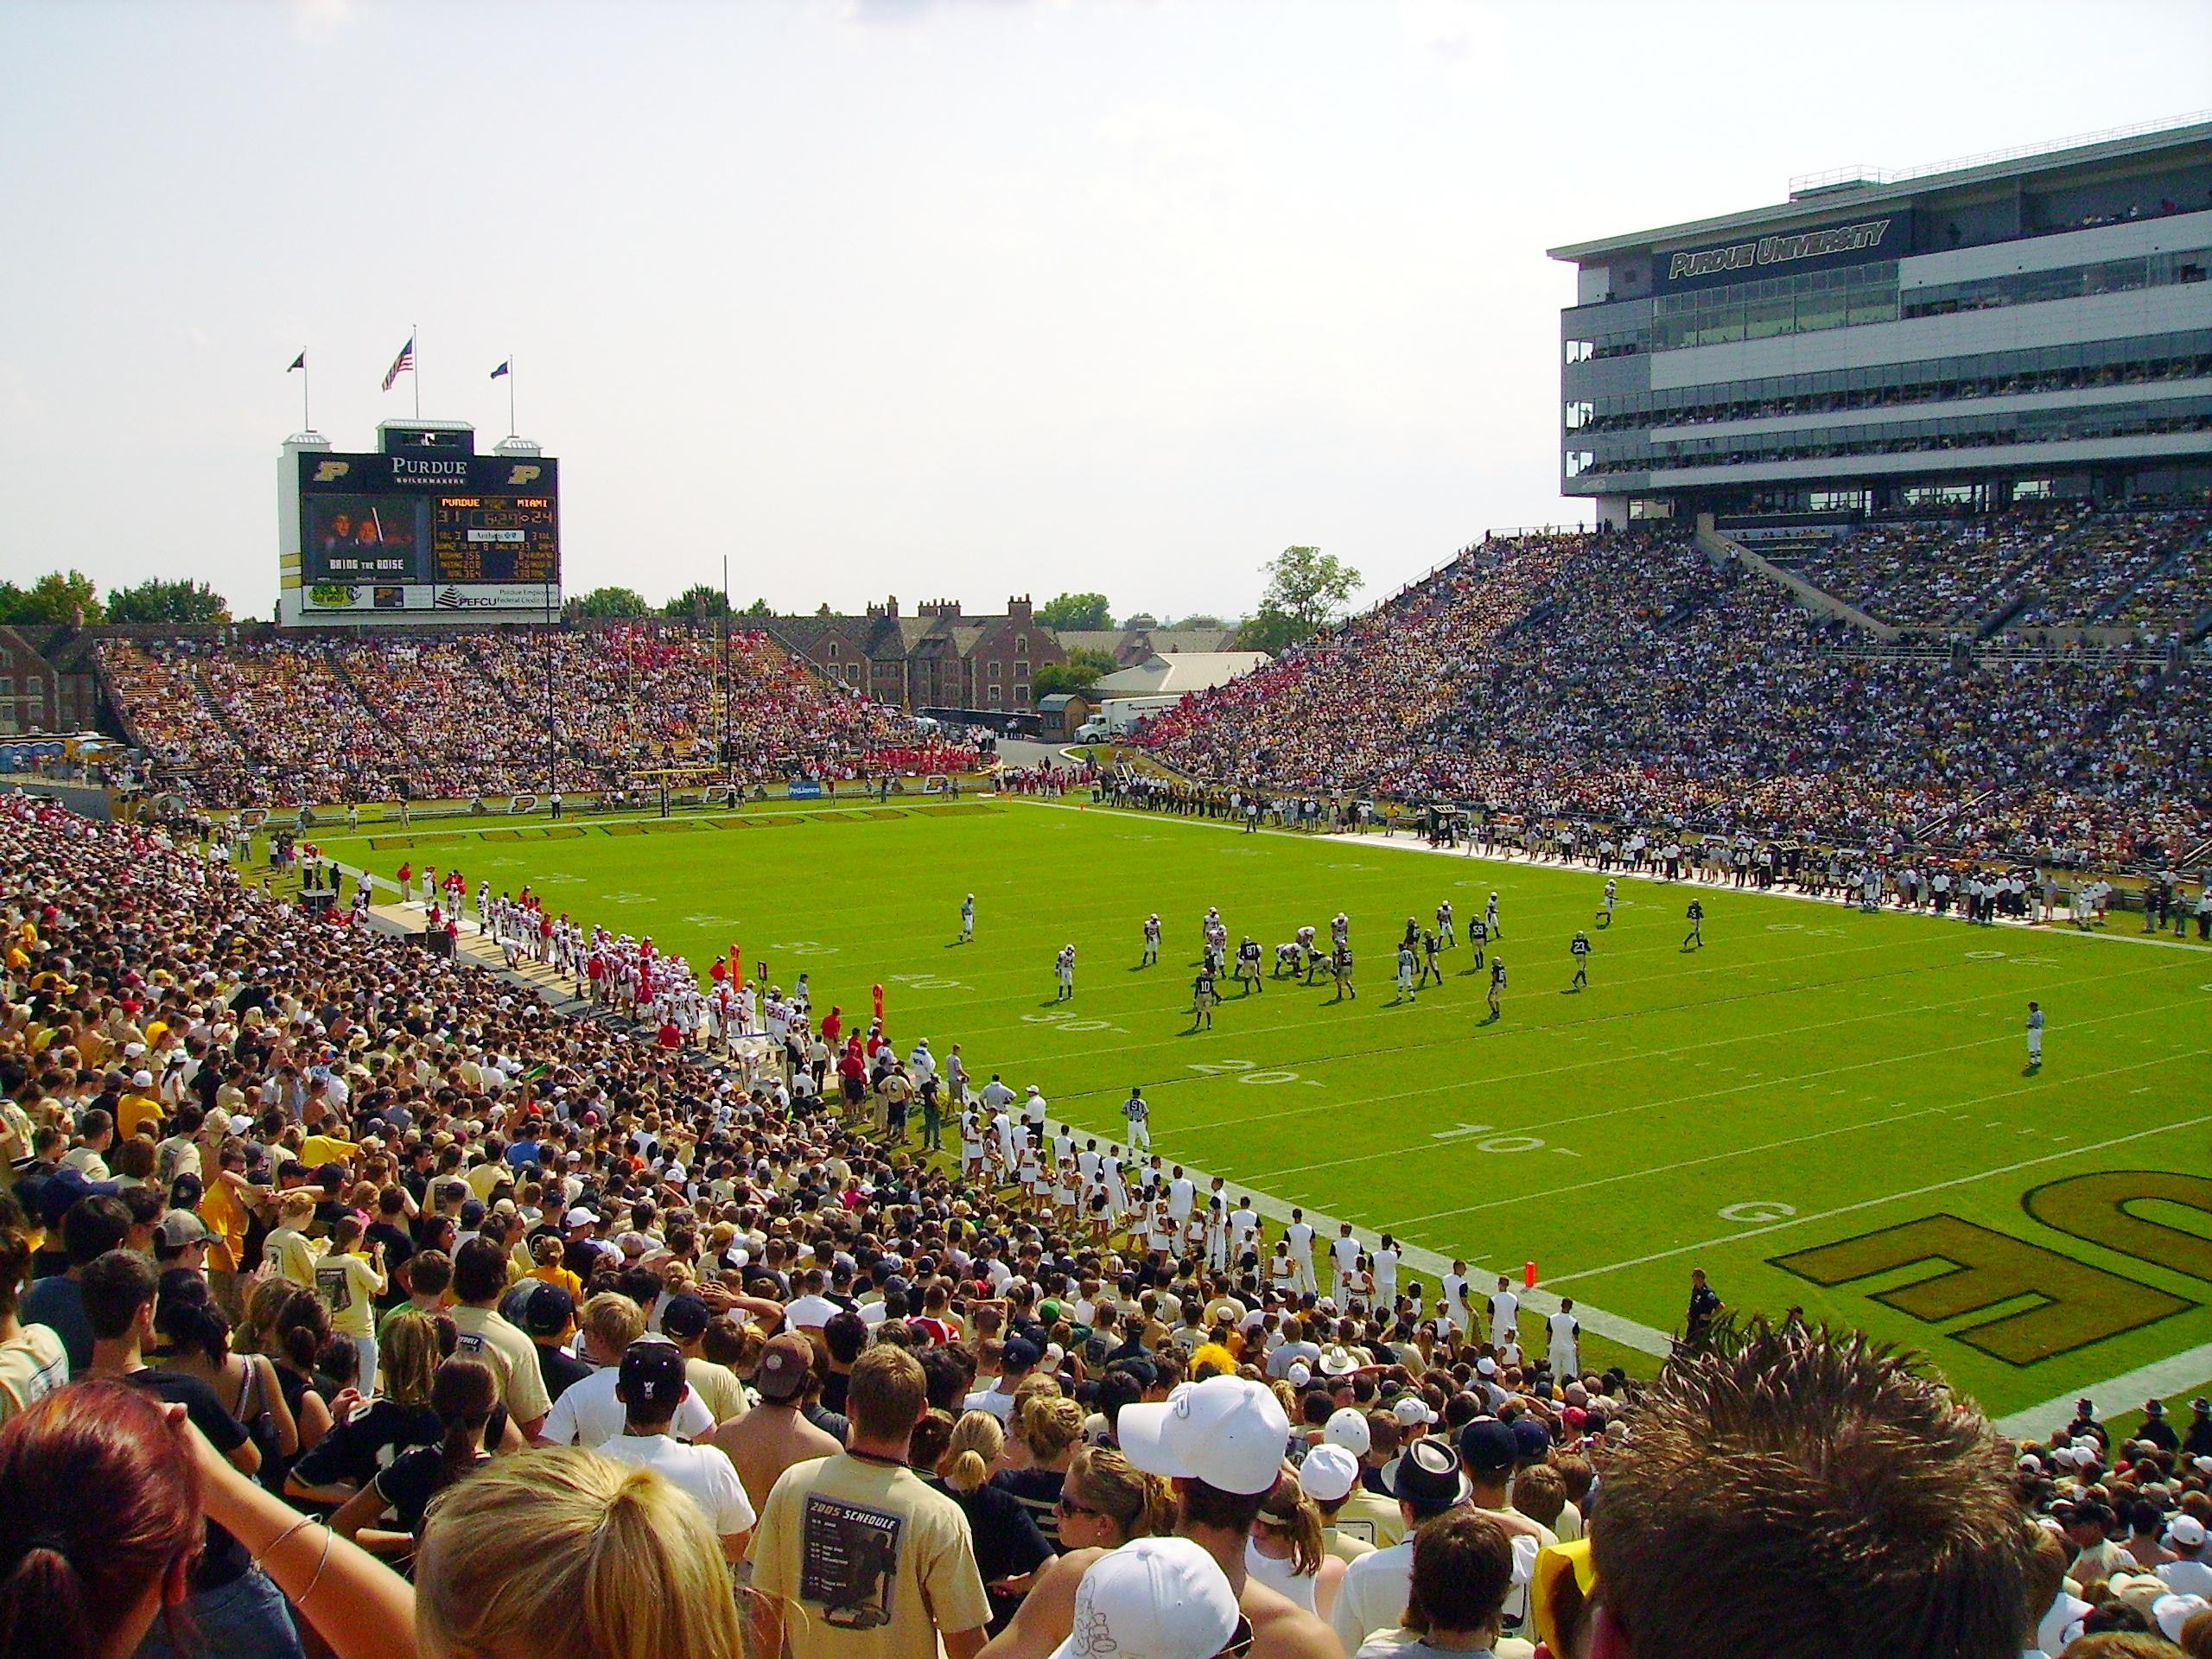 Ross–Ade Stadium